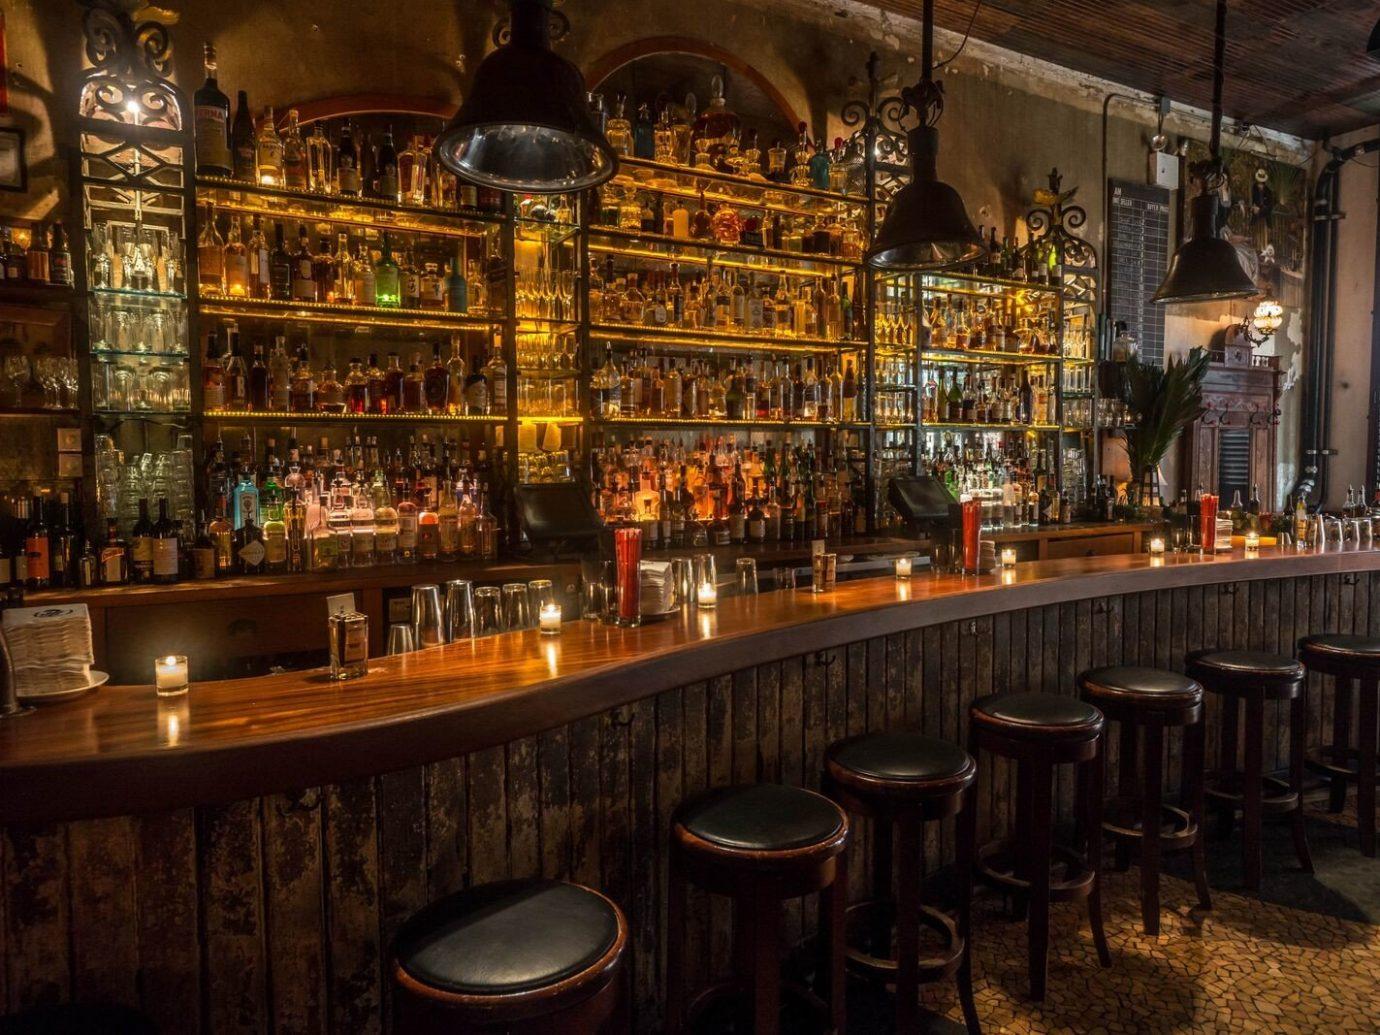 Food + Drink Romance indoor Bar building tavern restaurant table several